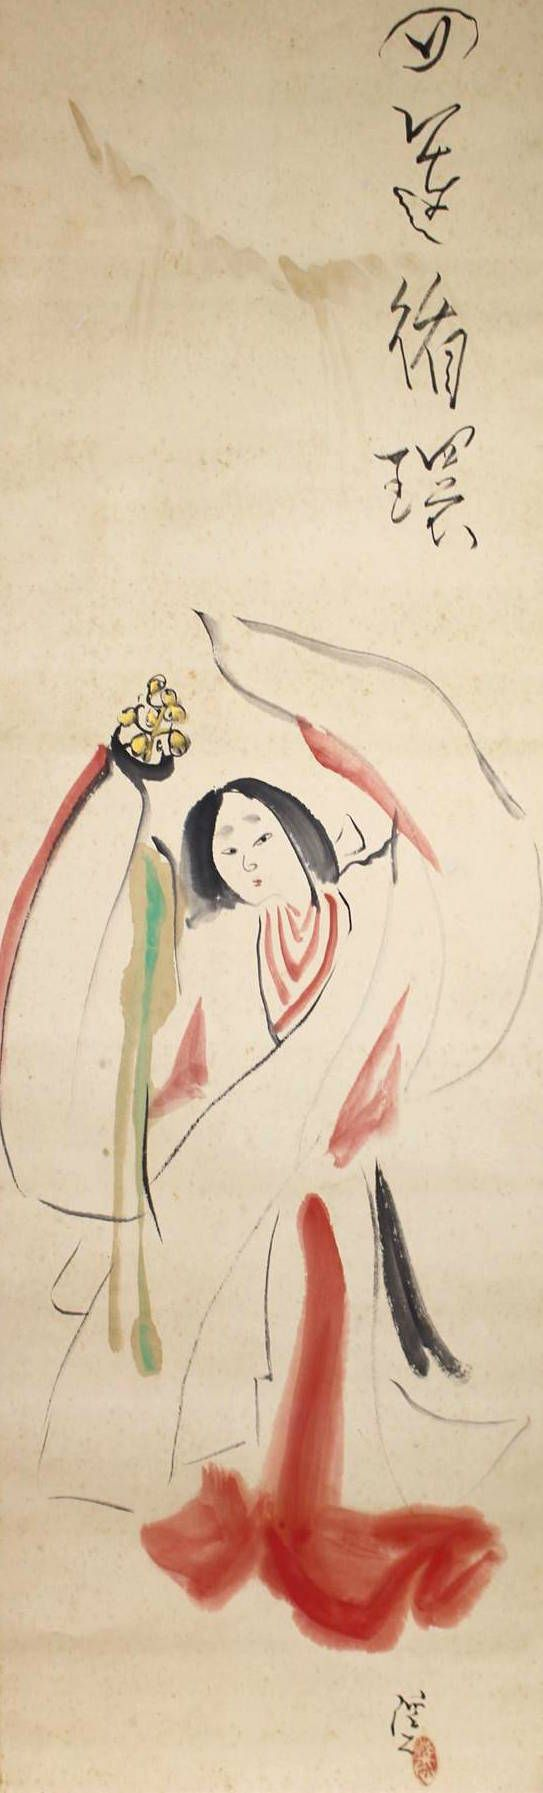 Tomita Keisen 富田渓仙/冨田渓仙 (1879-1936), Kagura Dancer.